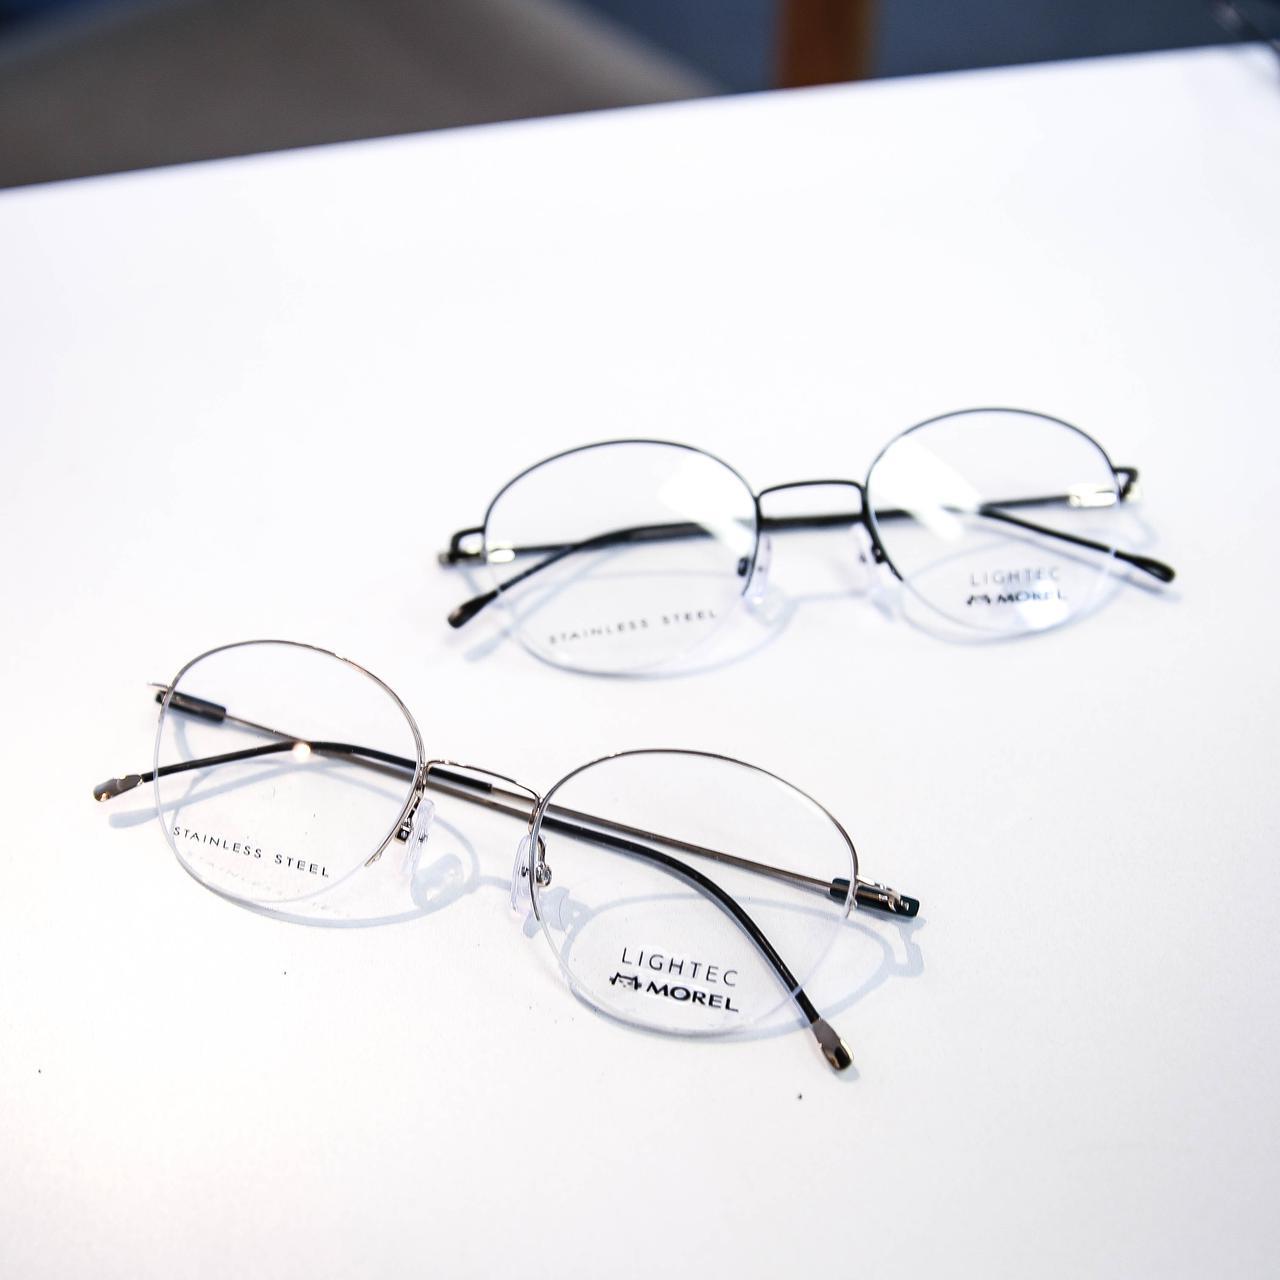 Fashionable eyewear White Plains New York.